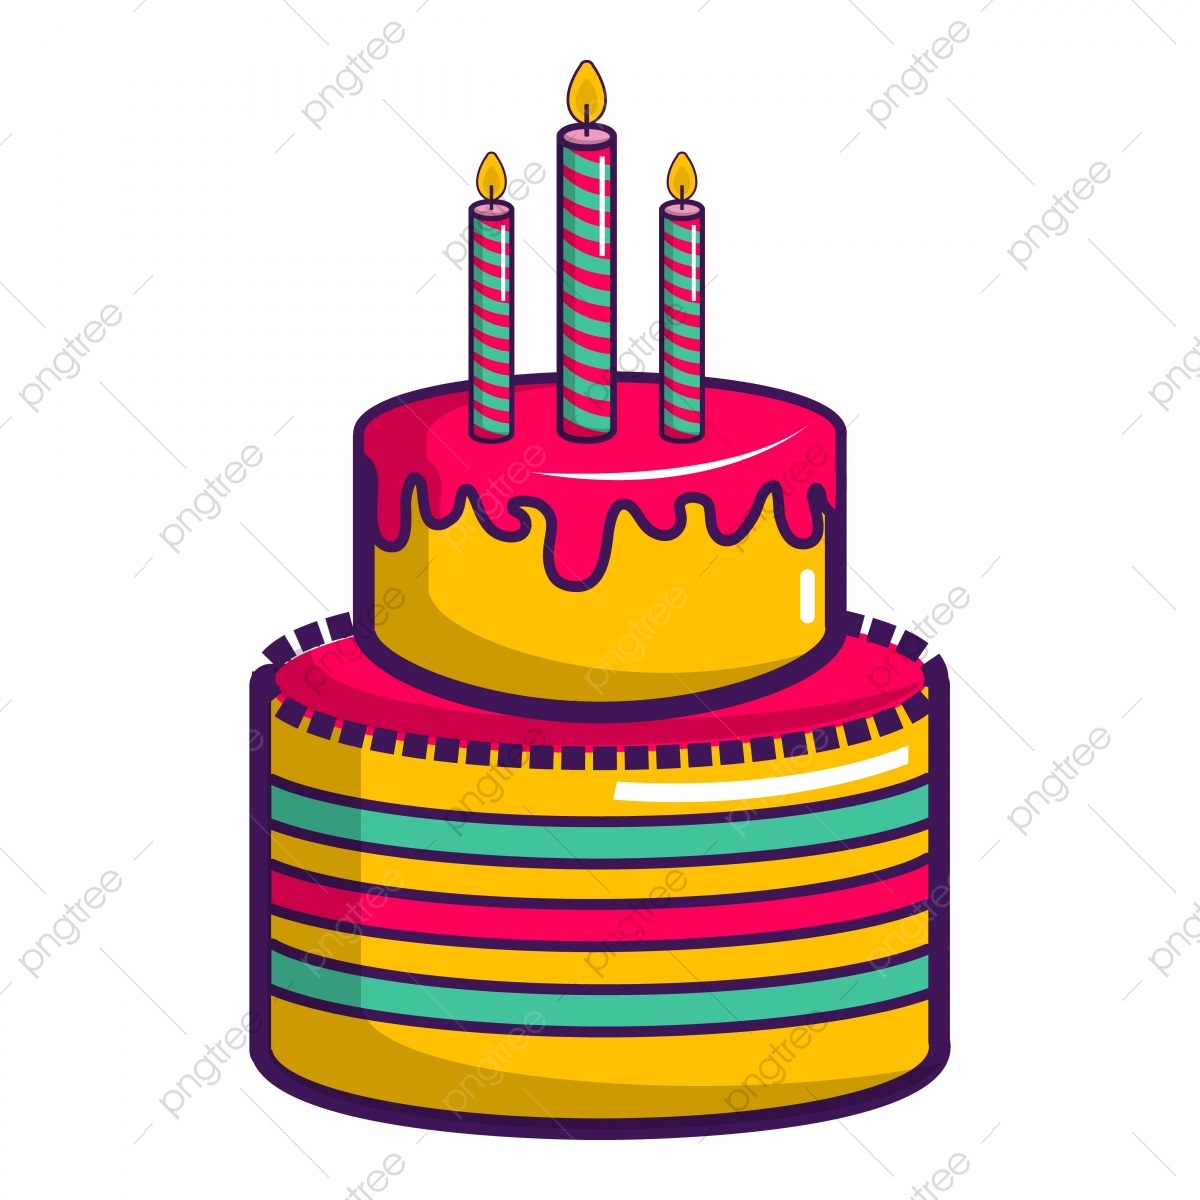 Admirable Colorful Birthday Cake Icon Cartoon Style Candle Sweet Cartoon Funny Birthday Cards Online Kookostrdamsfinfo